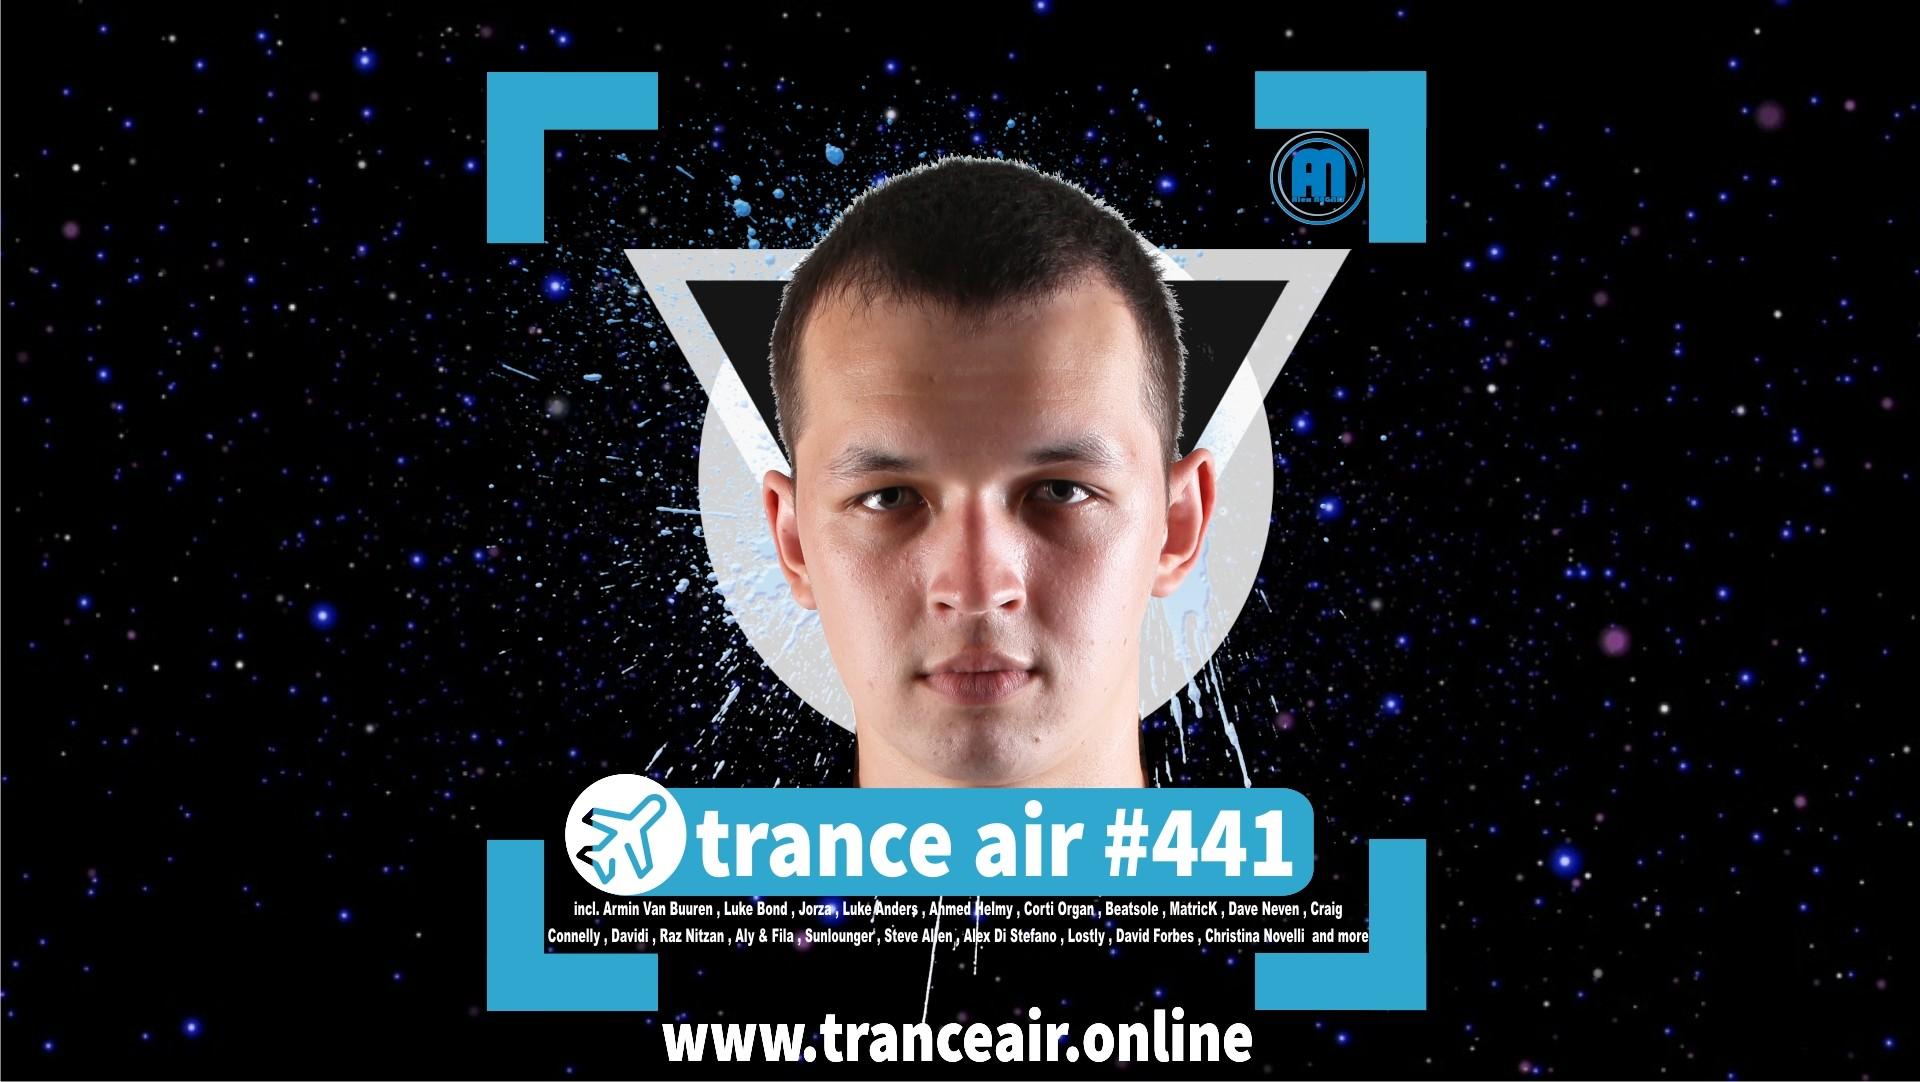 Alex NEGNIY - Trance Air #441 // Video Preview